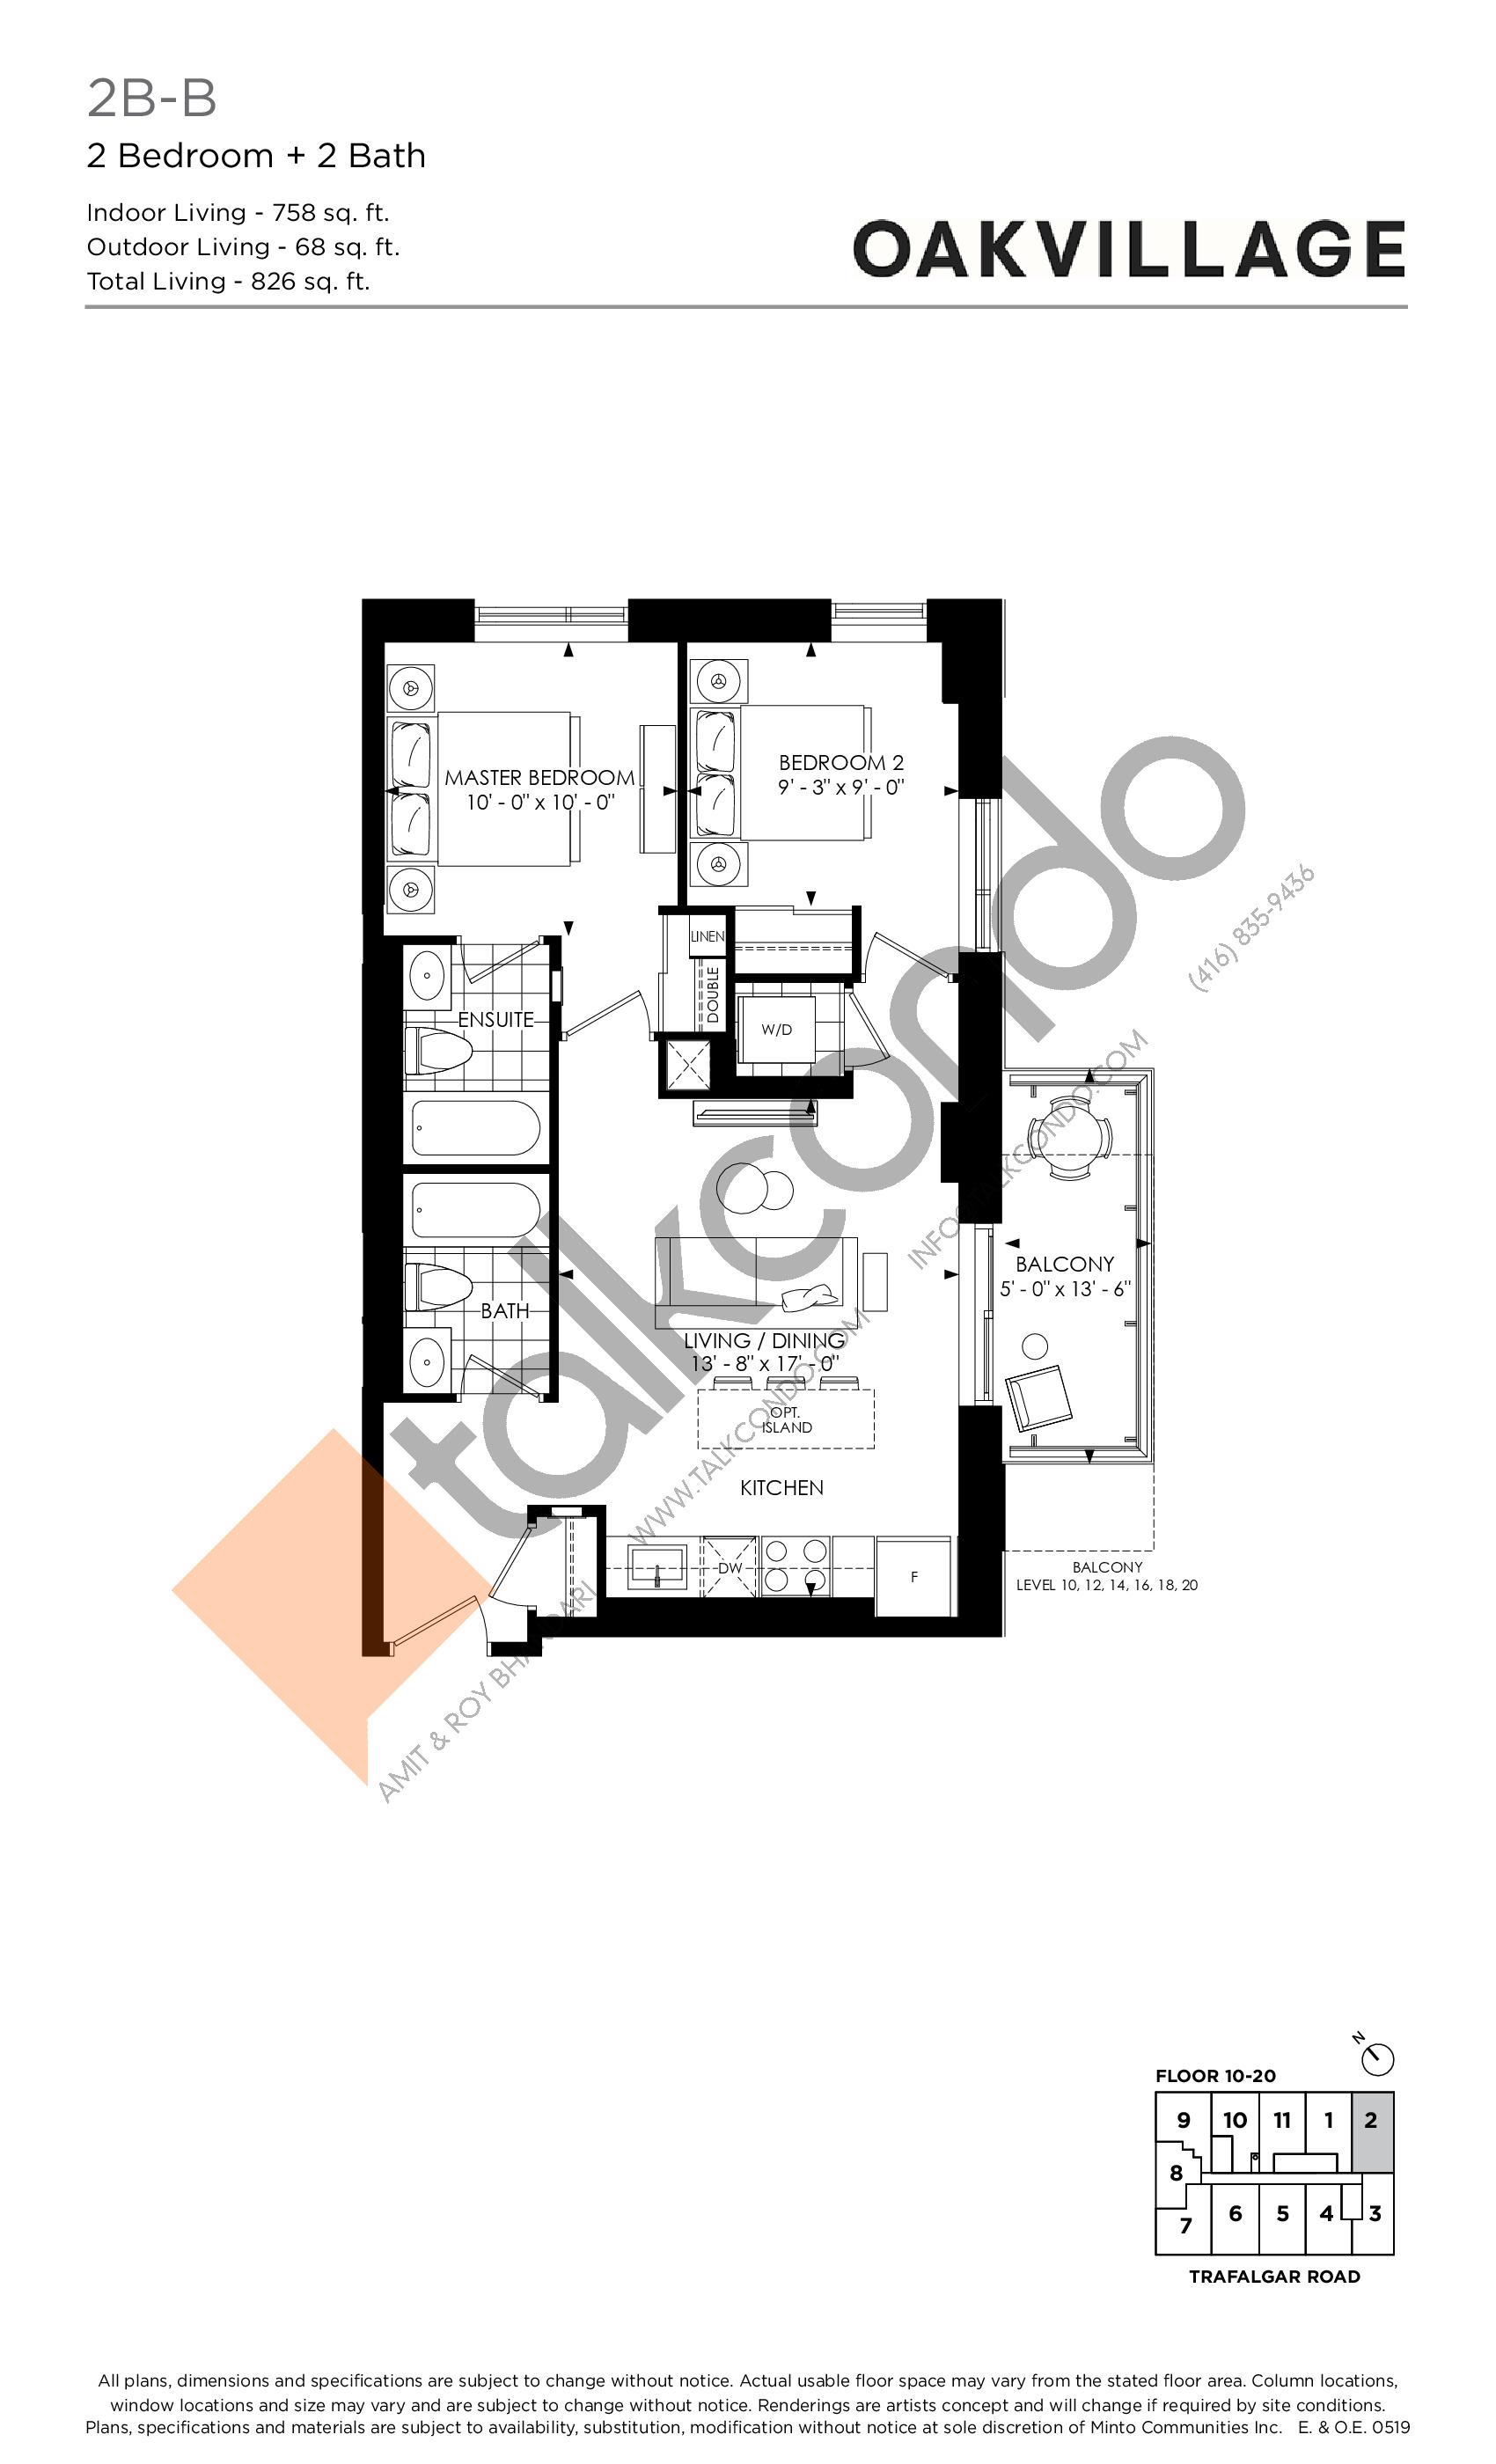 2B-B (Tower) Floor Plan at Oakvillage Phase 2 - 758 sq.ft